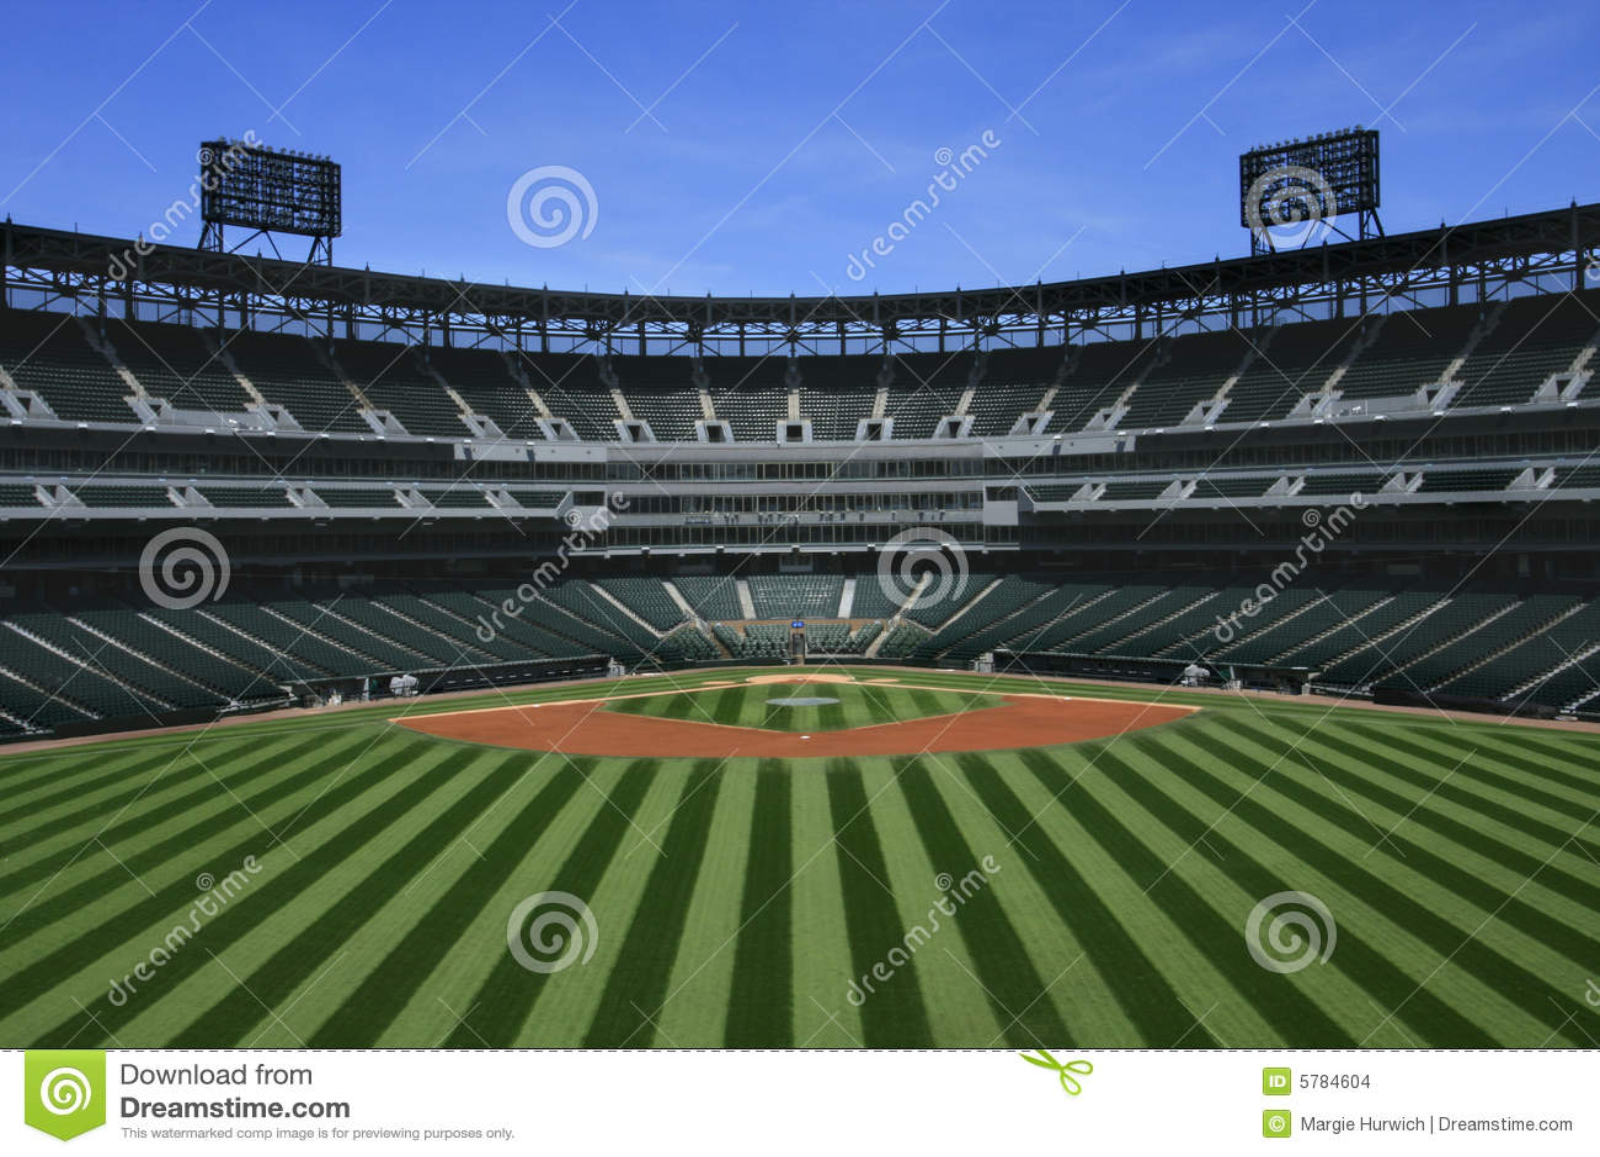 Estadio de béisbol